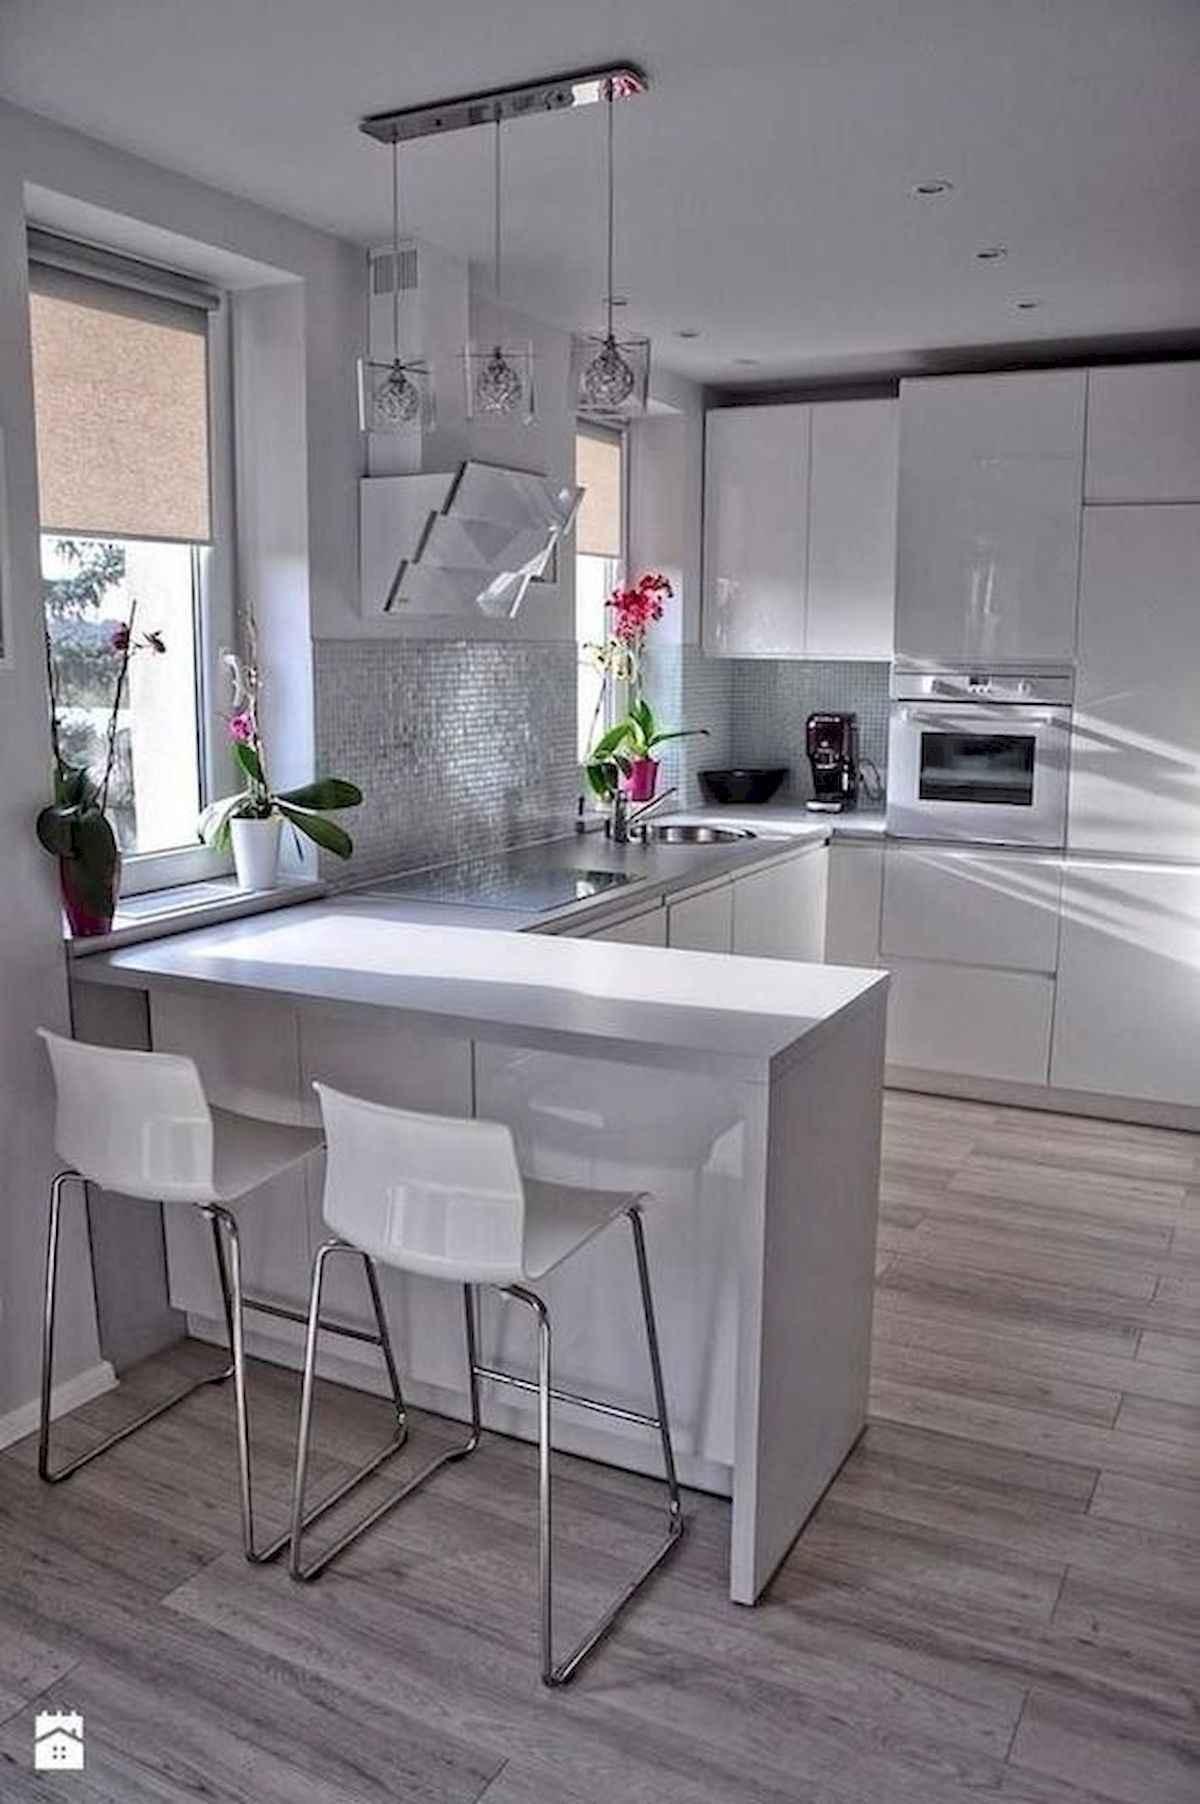 28 Small Kitchen Design Ideas: 50 Best Small Kitchen Design Ideas And Decor (28